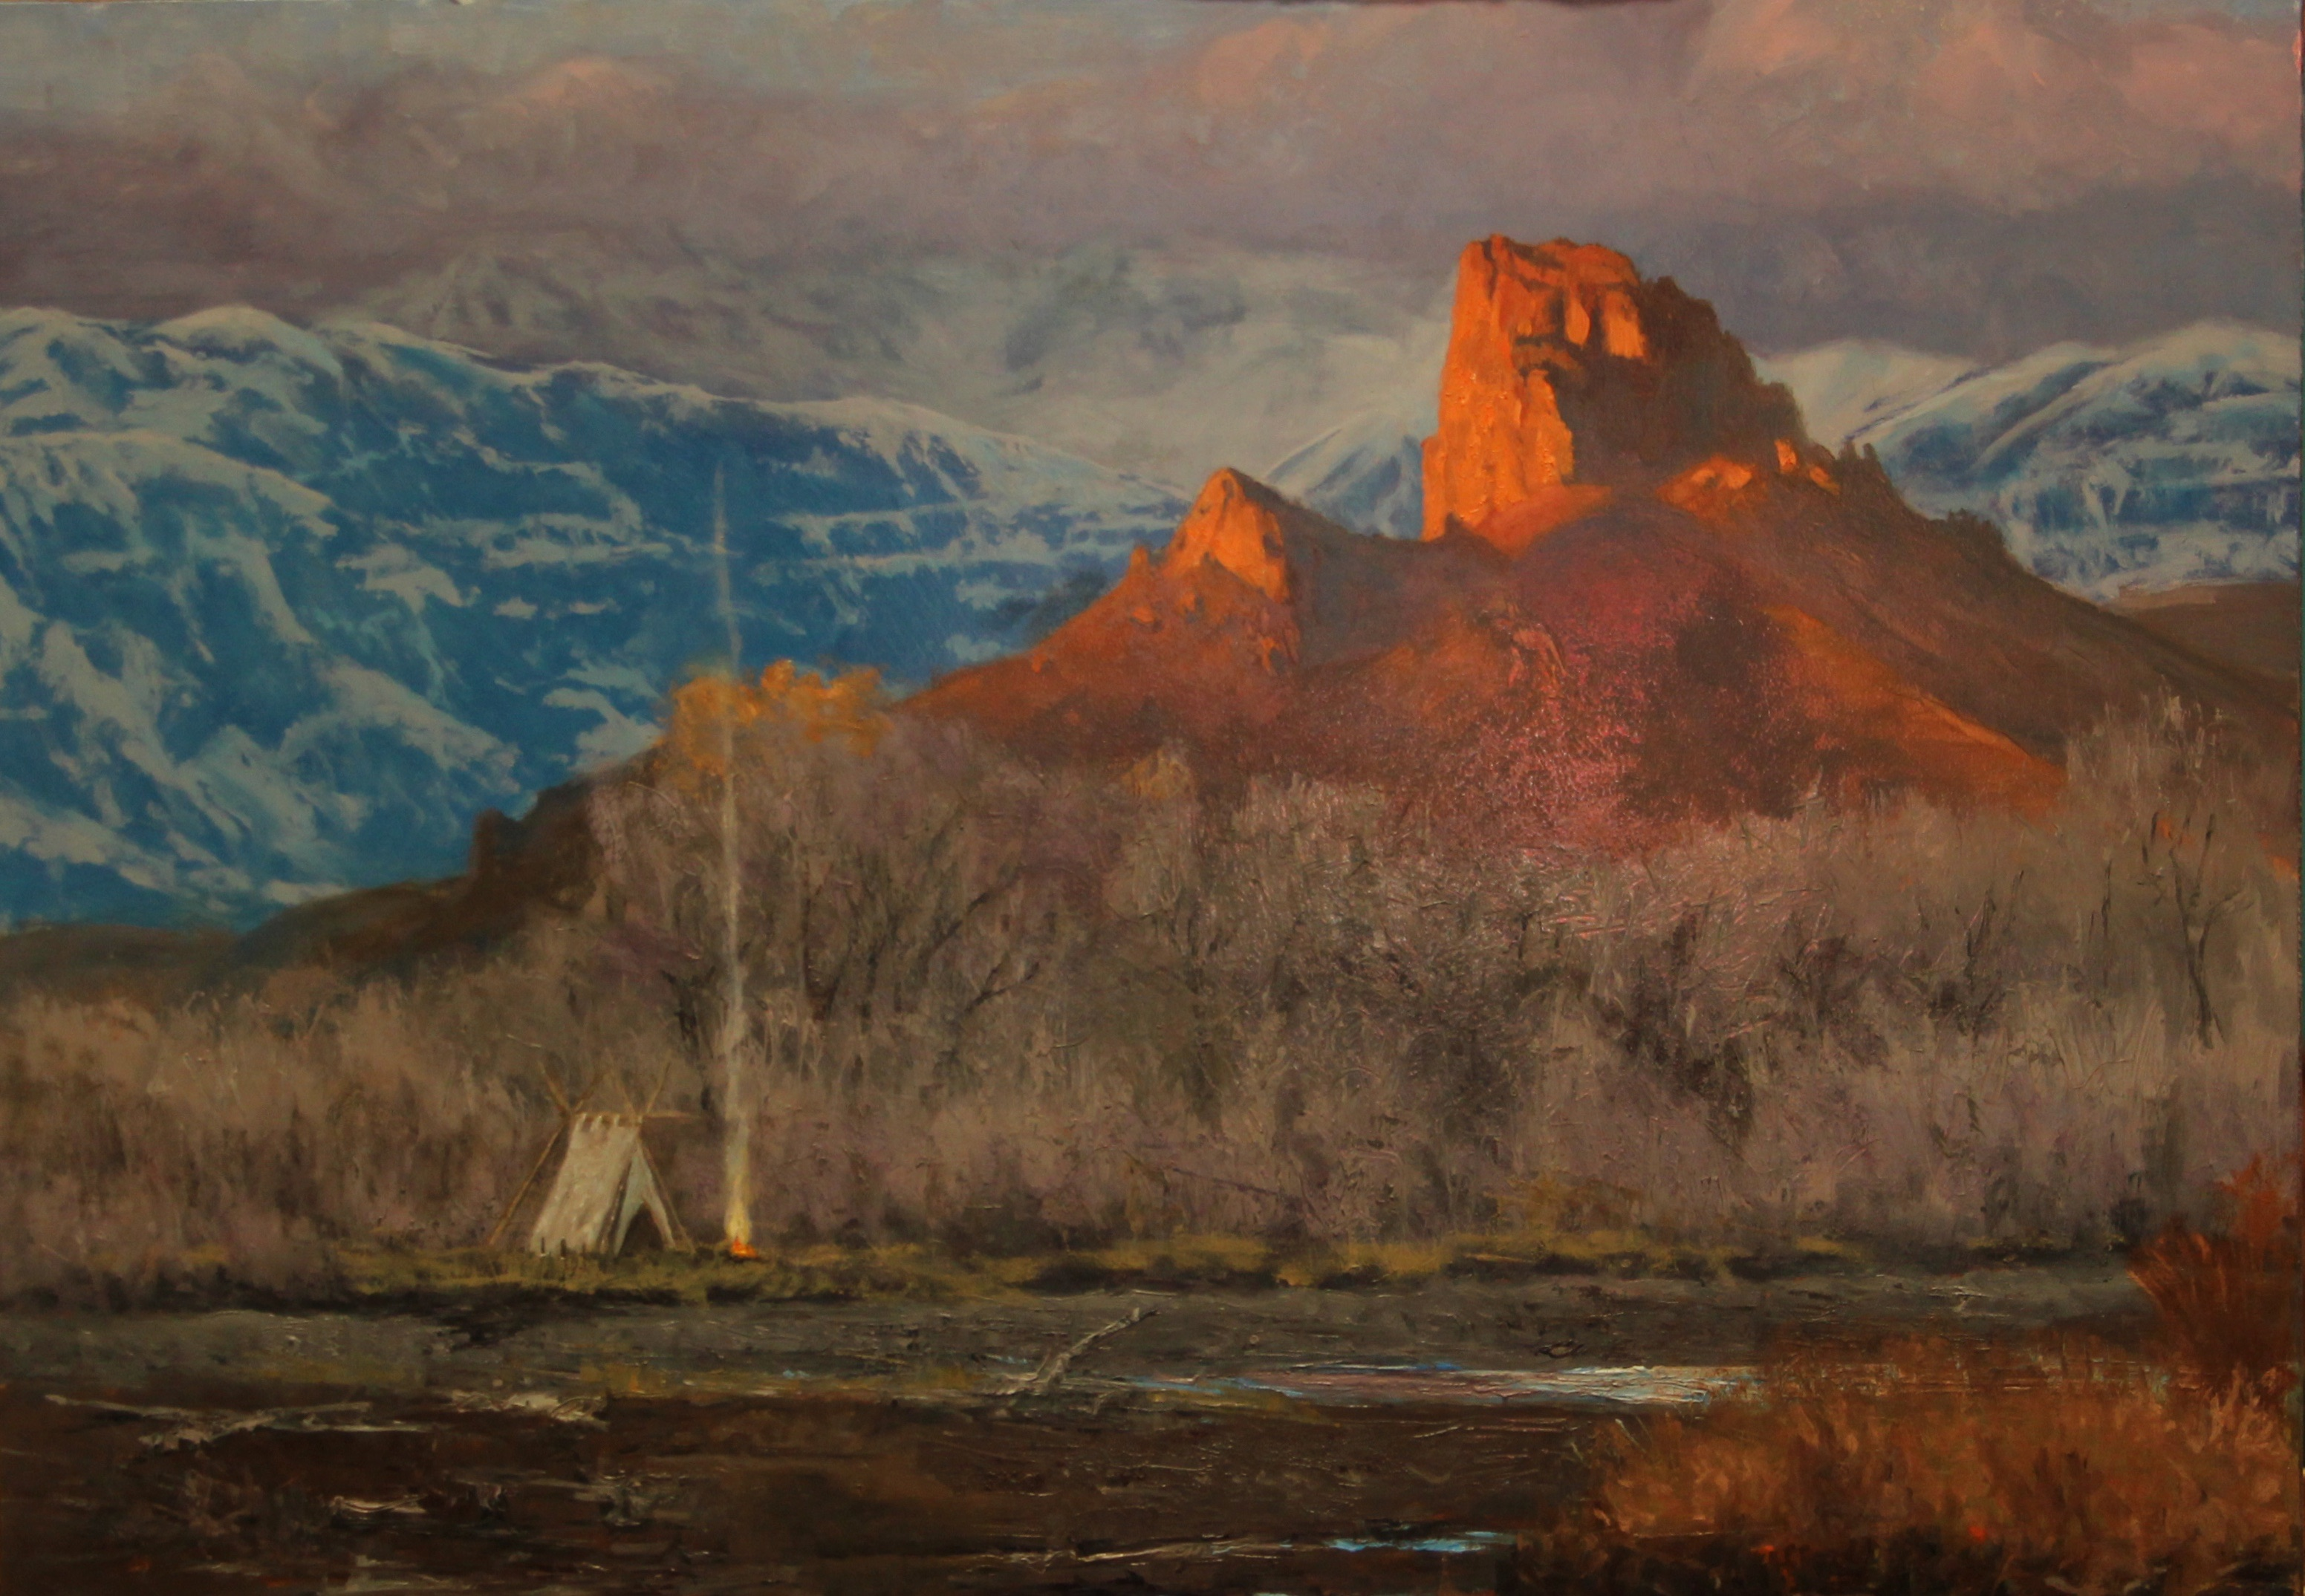 Camp at Castle Rock